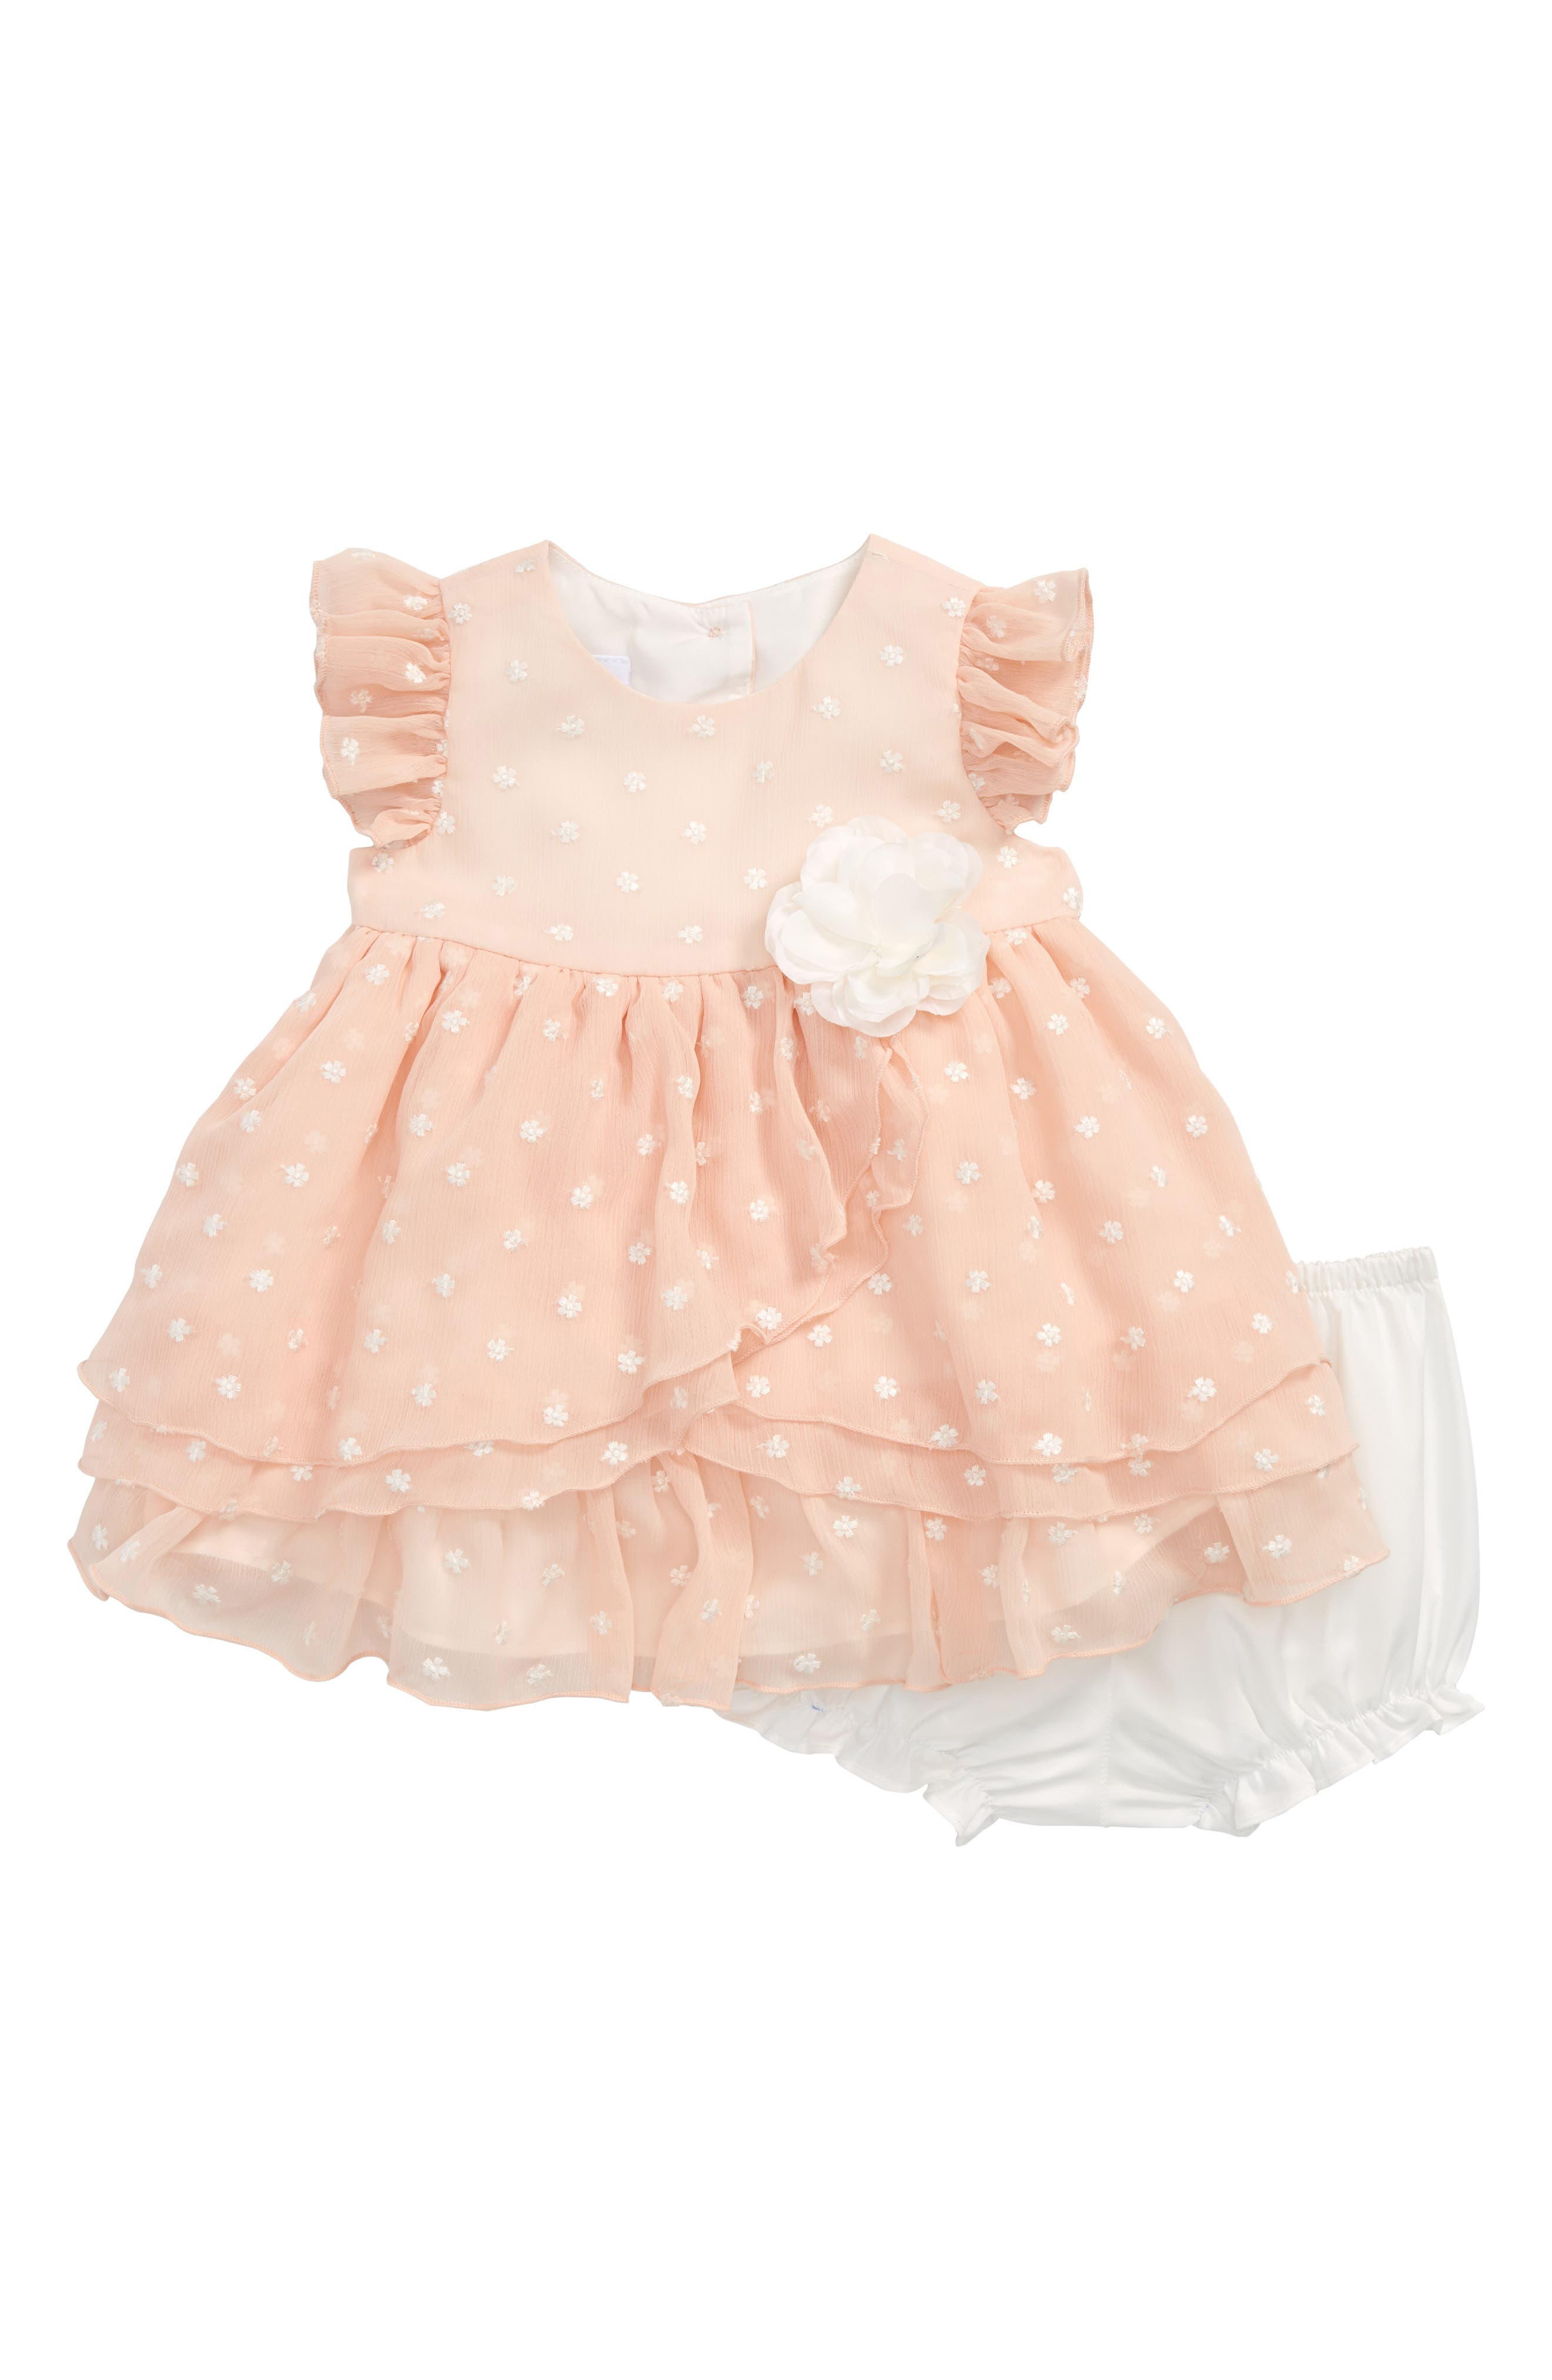 Crinkle Chiffon Dress,                             Main thumbnail 1, color,                             950